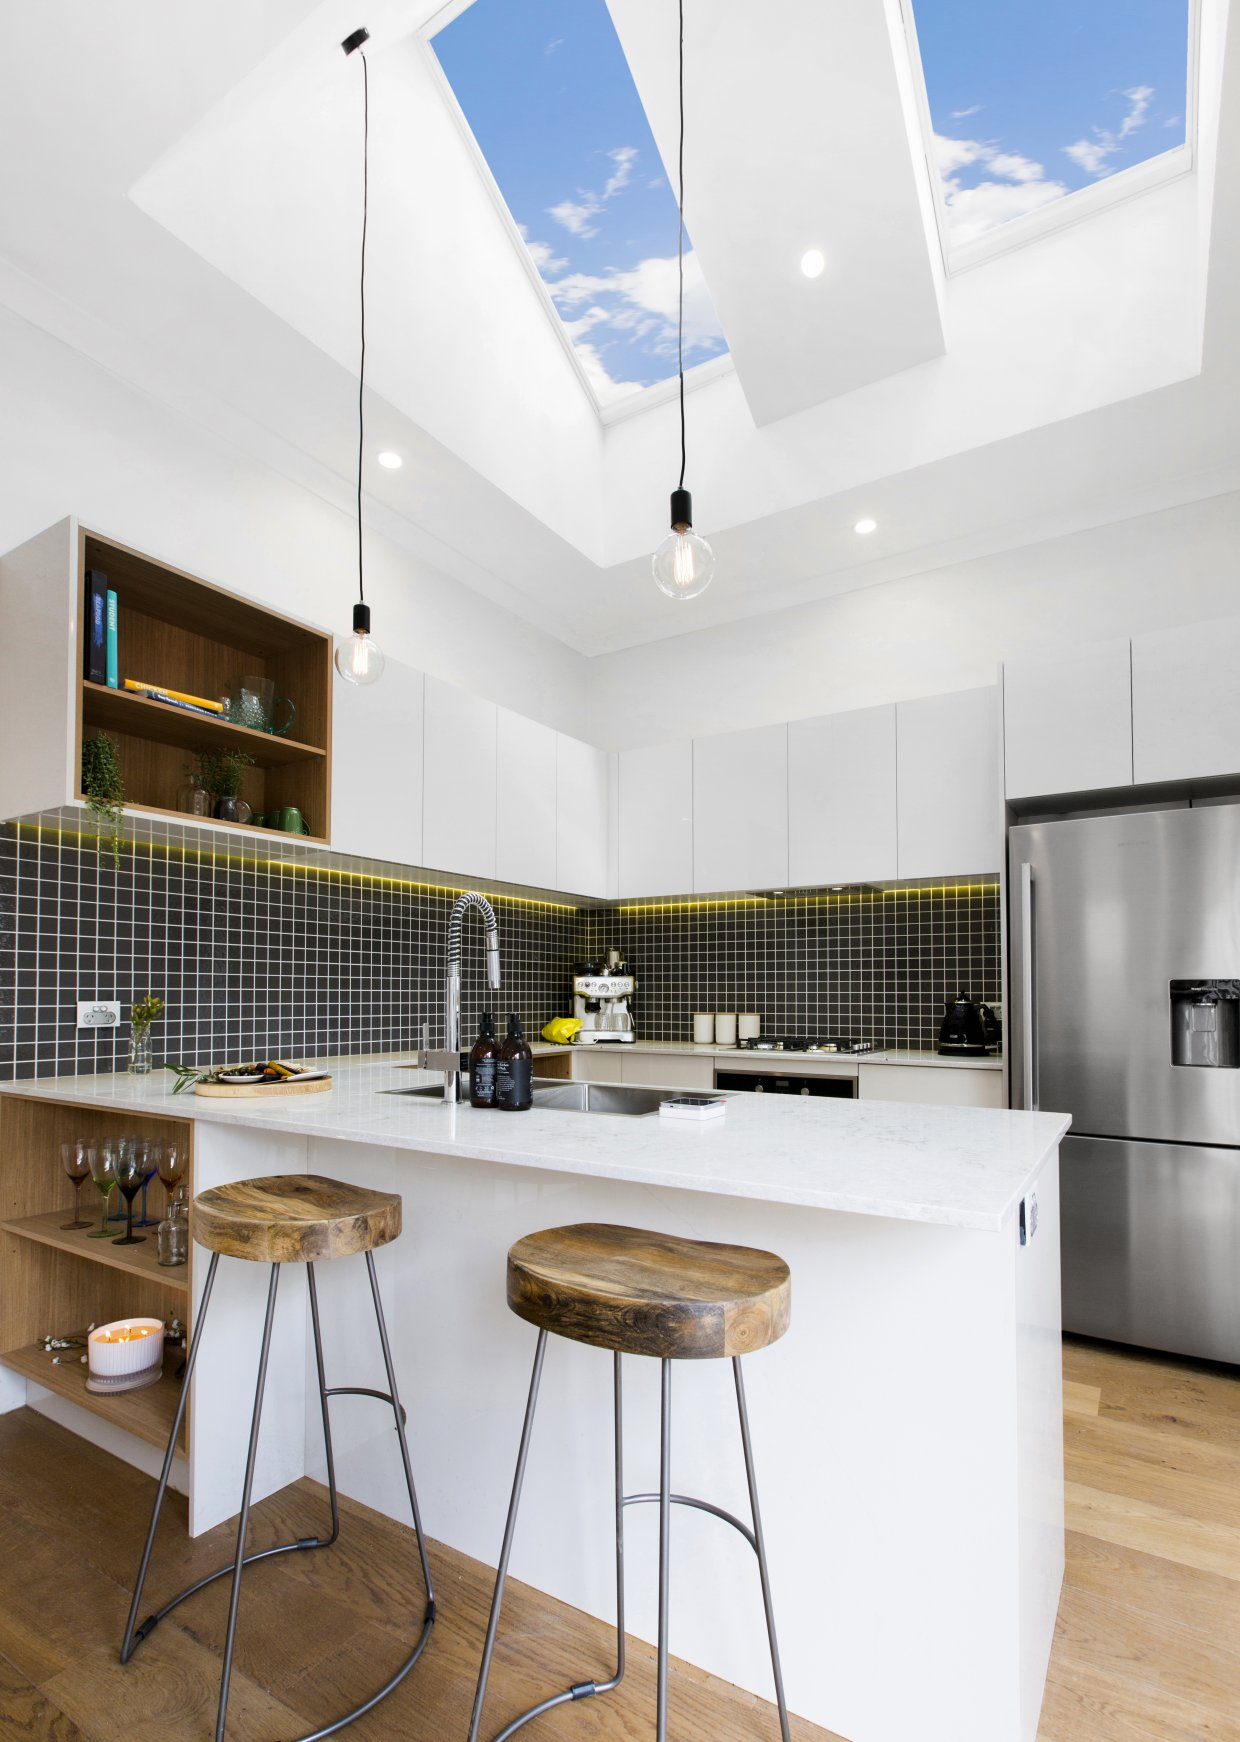 Kitchen Ideas Ealing.Superbealing Kitchen Skylight Ideas Of Solar P 23221 Acnn Decor